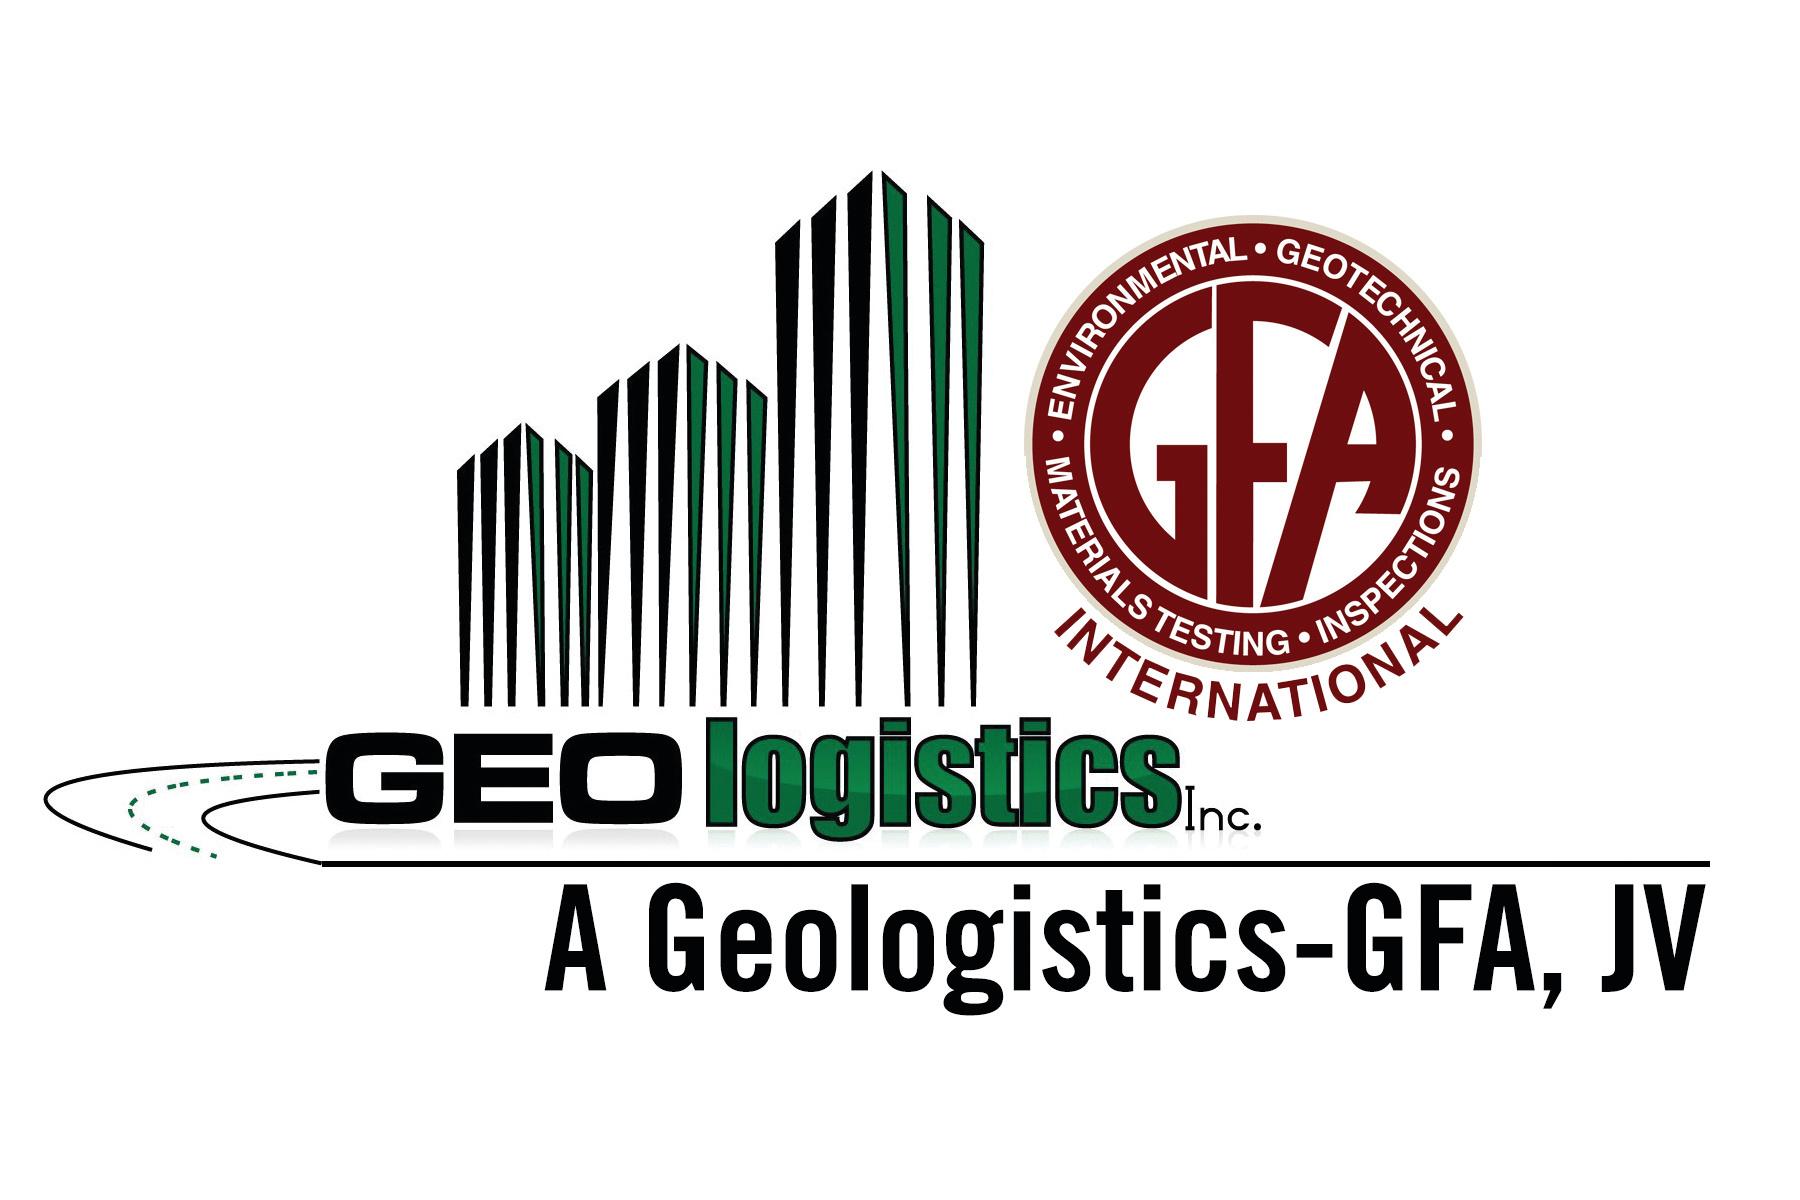 client-logos-GFA-GEO Joint Venture